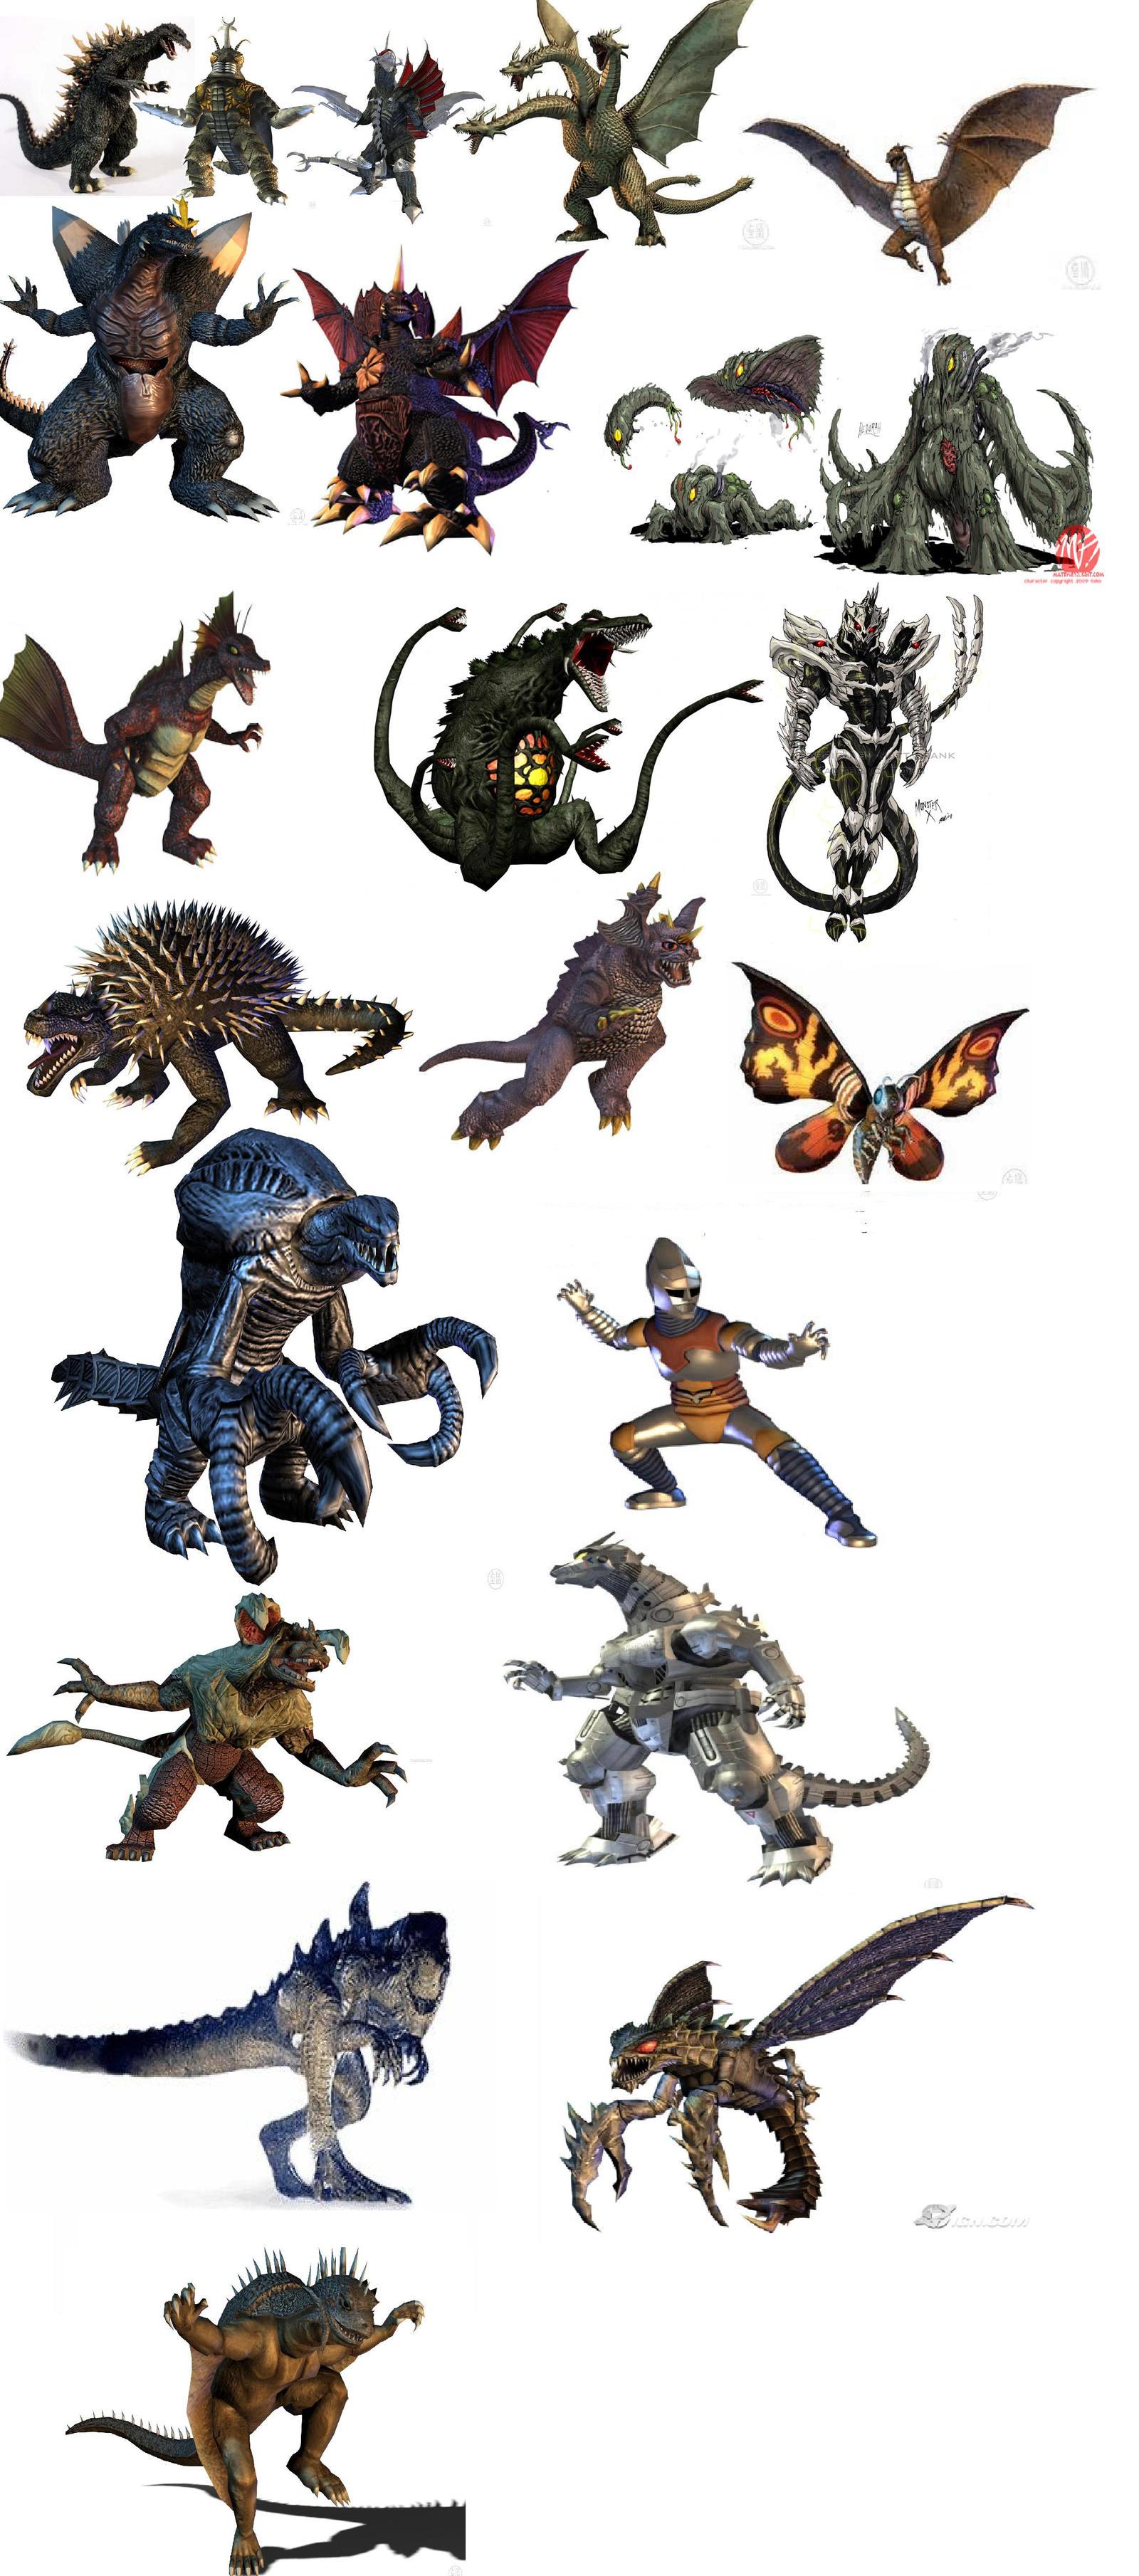 2014 Godzilla New Monsters Autos Post